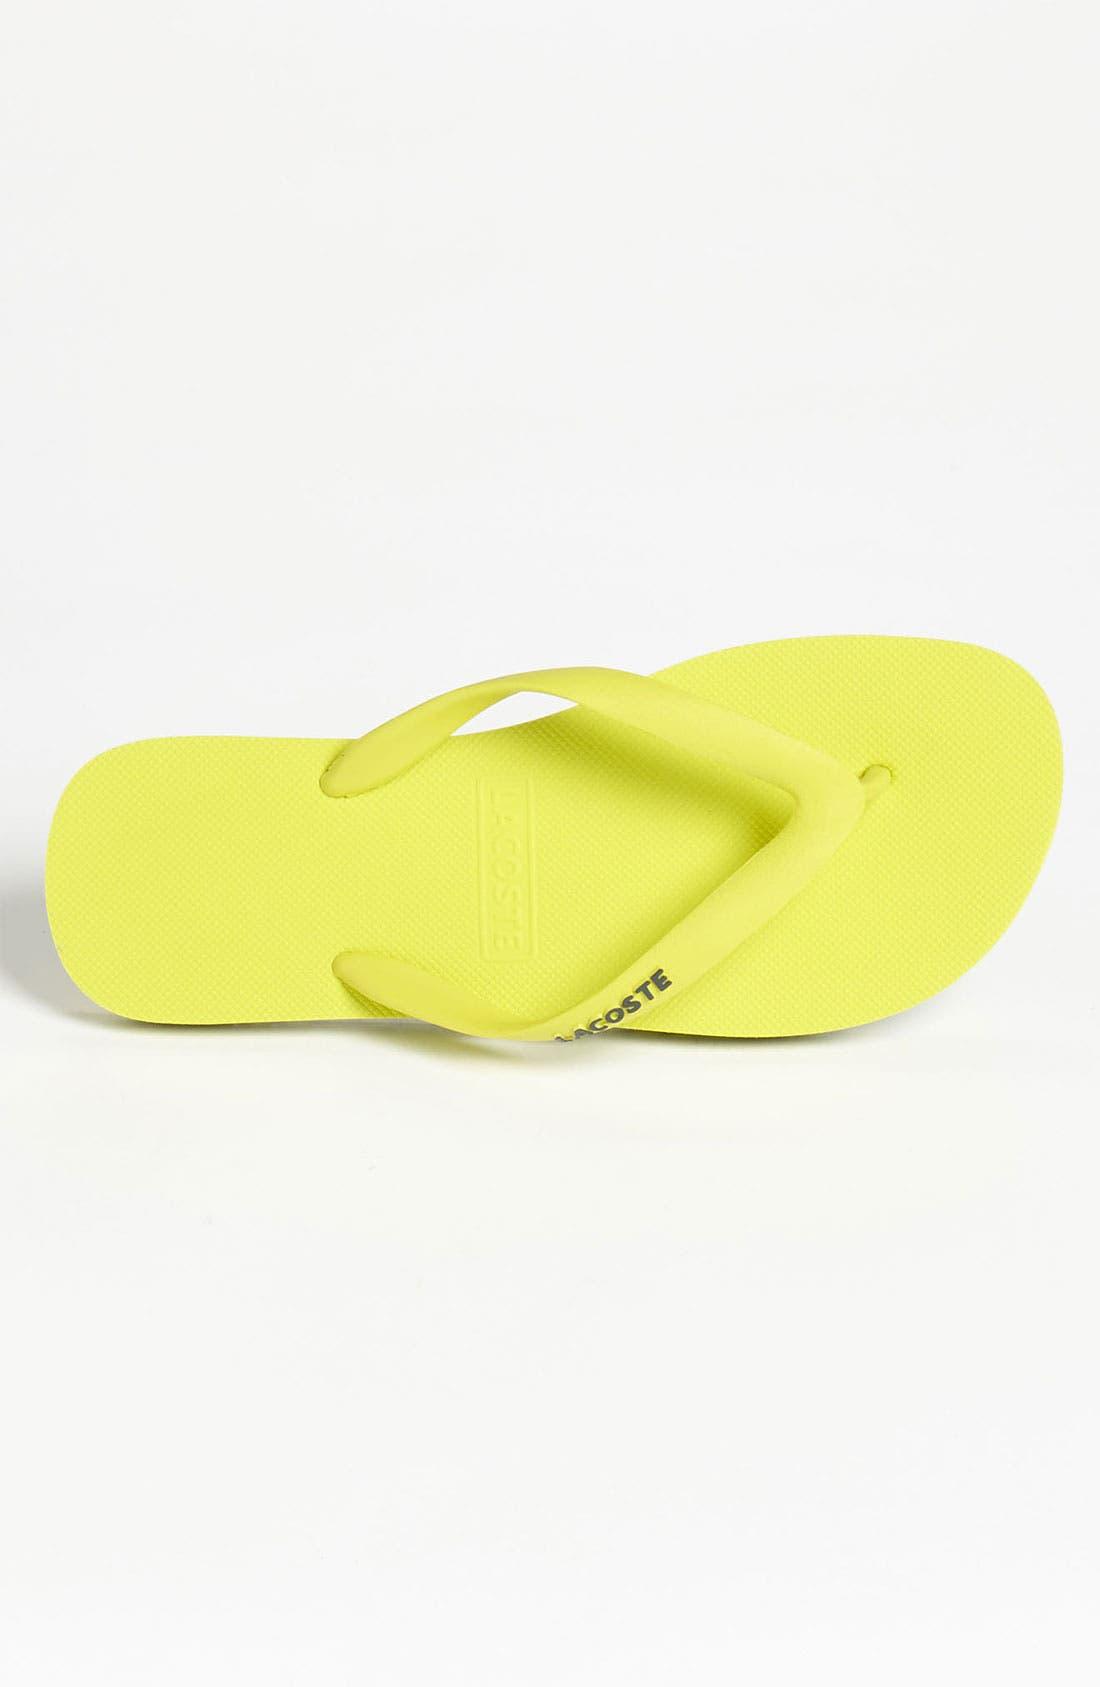 Alternate Image 3  - Lacoste 'Nosara Jaw' Flip Flop (Men)